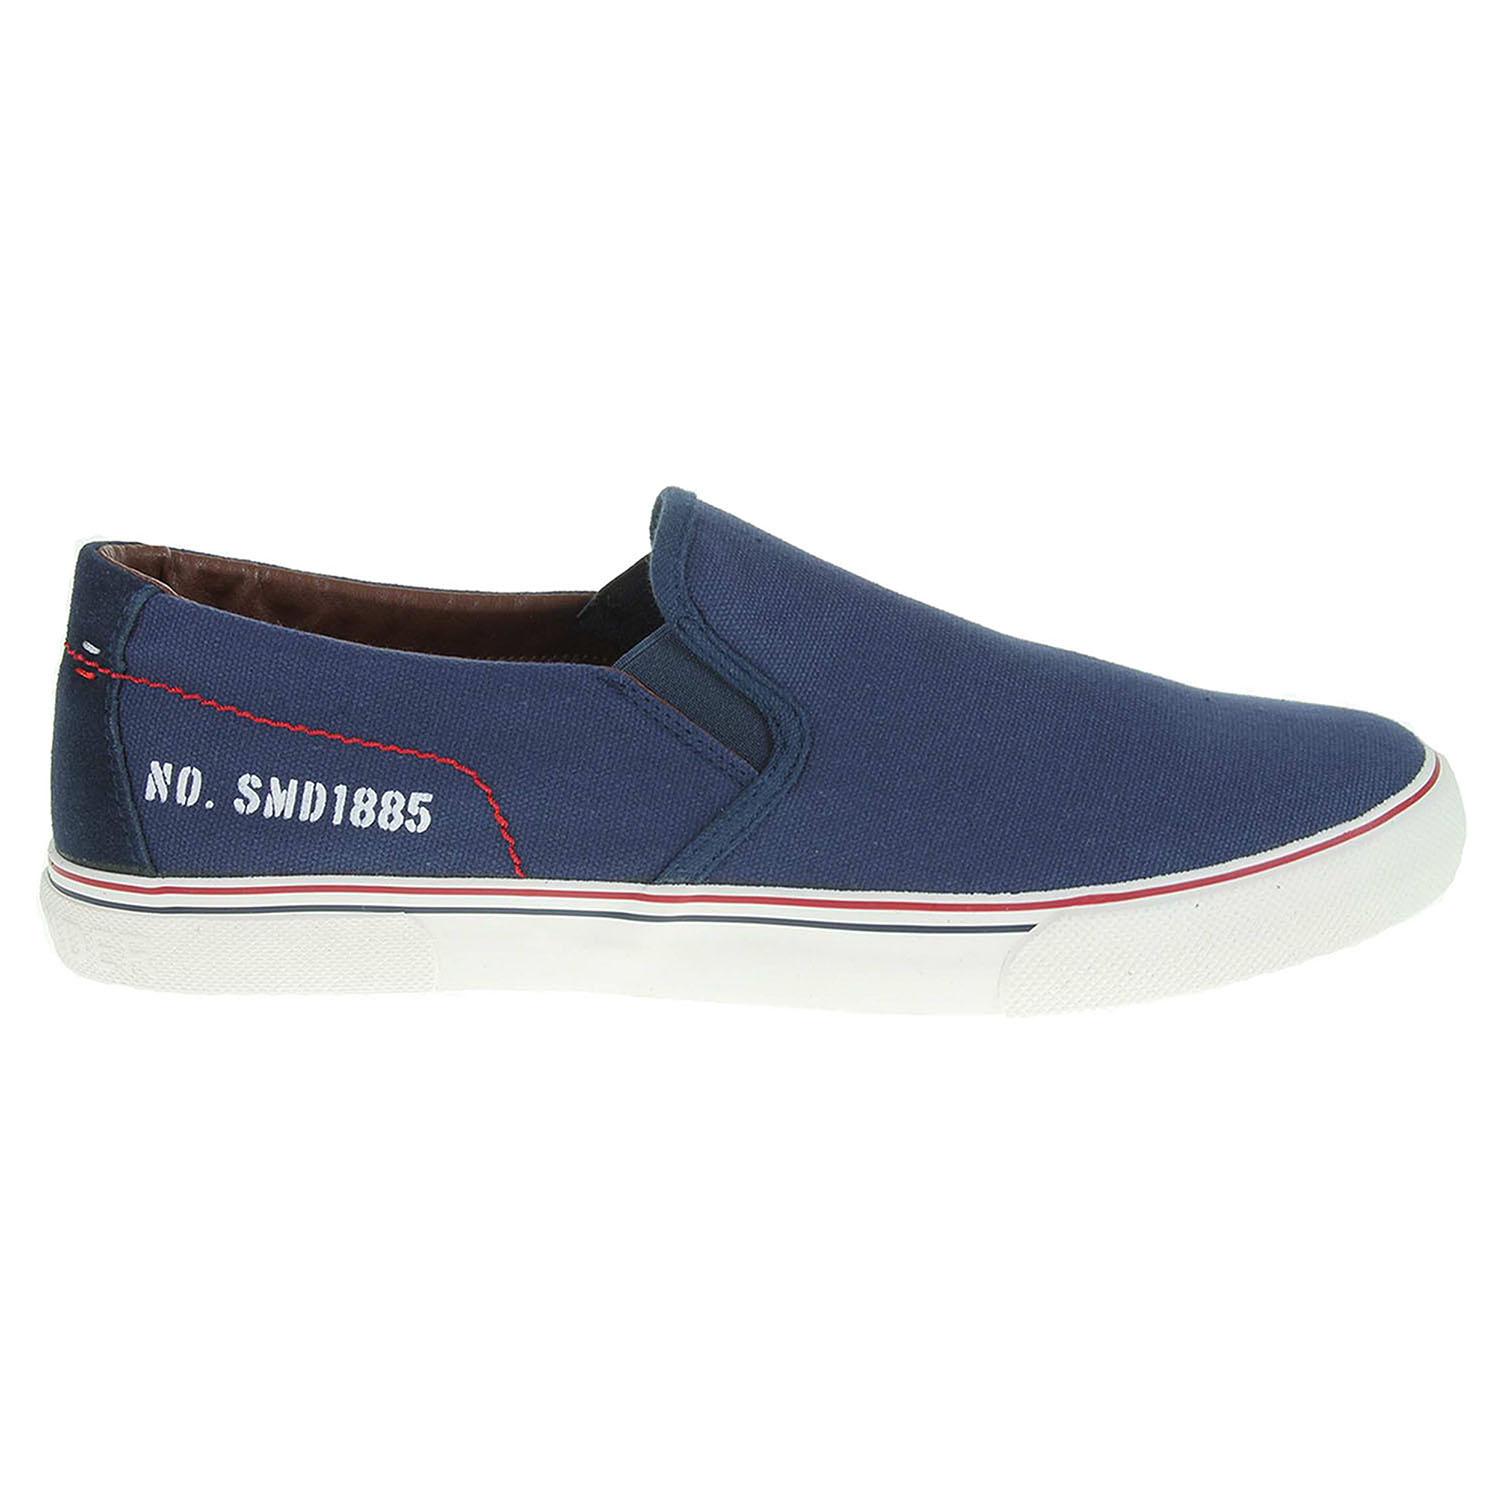 Ecco Salamander pánská obuv 60303-32 modrá 24000417 96c1b3db0c